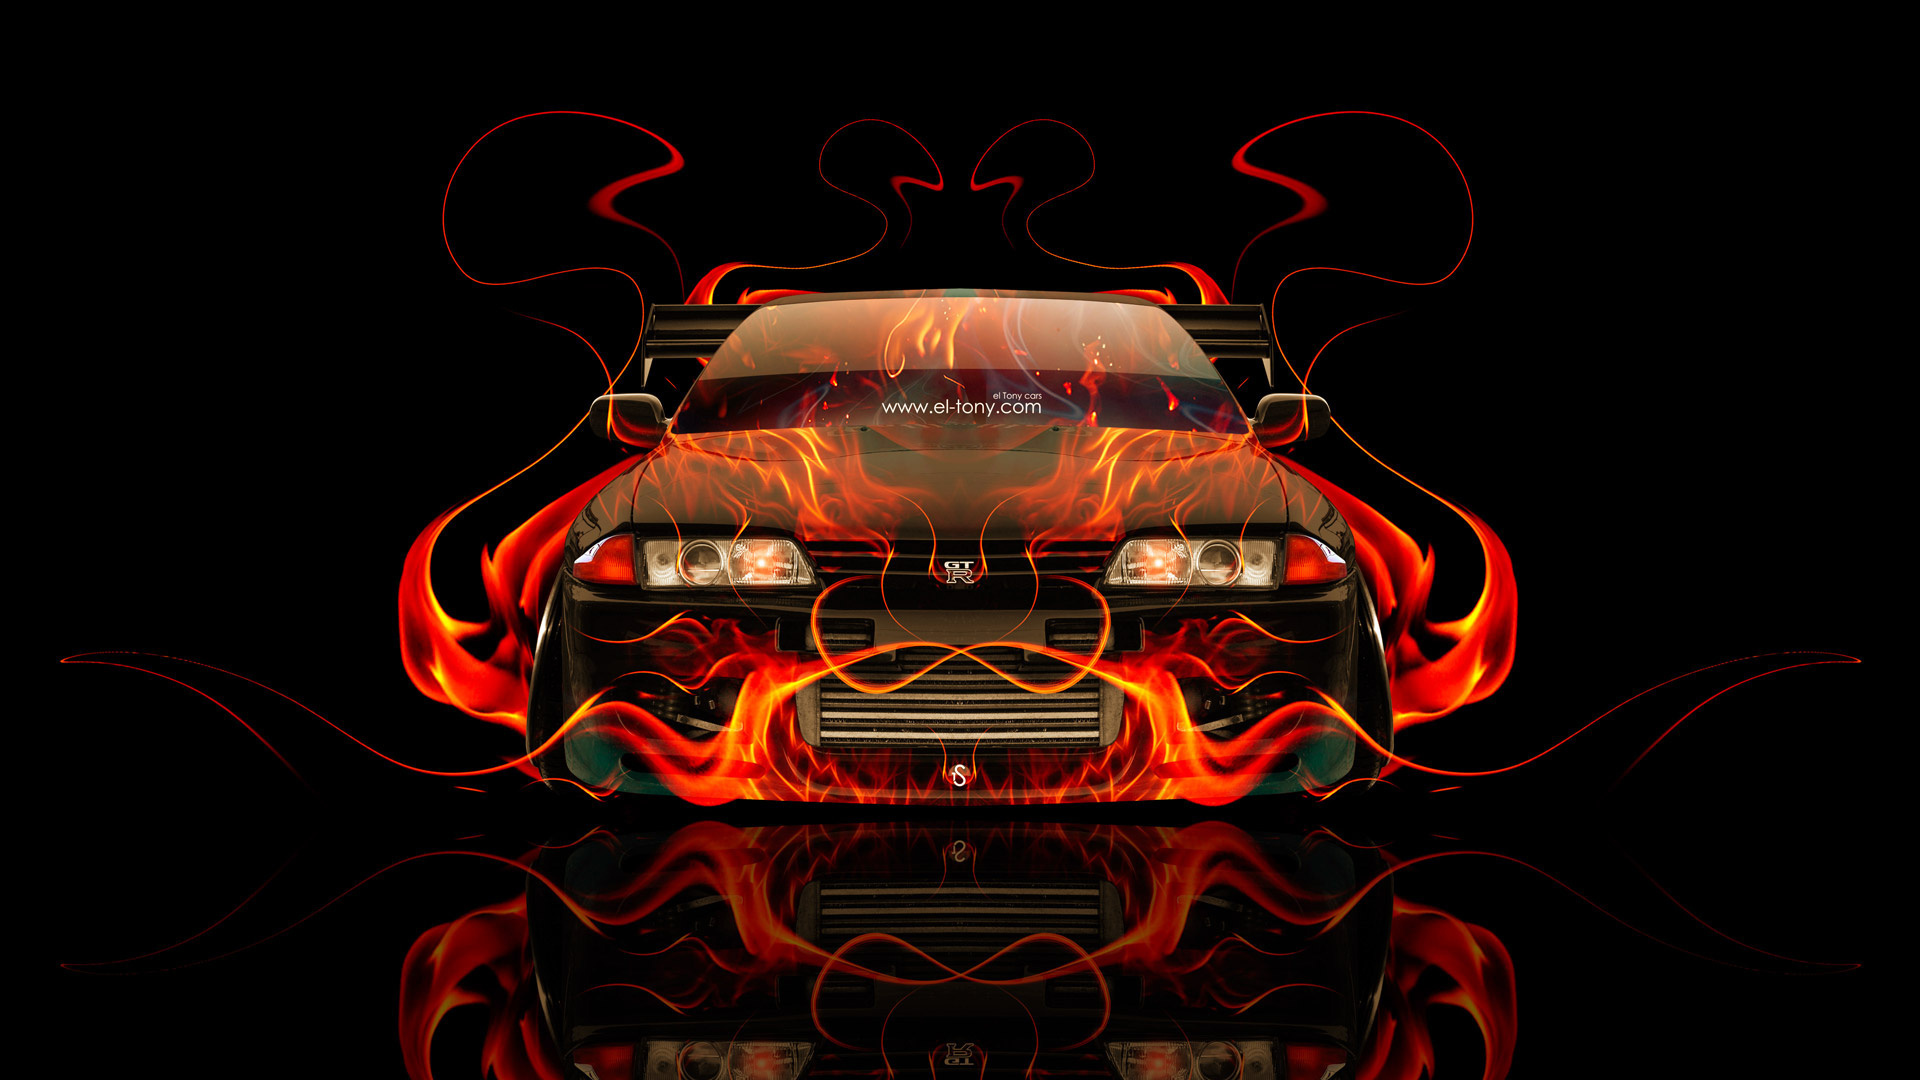 tony kokhan, nissan, skyline, gtr, r32, jdm, fire, car, abstract, orange, front, flame, black, tuning, el tony cars, photoshop, design, art, style, hd wallpapers, japan, тони кохан, фотошоп, ниссан, скайлайн, гтр, р32, 32 кузов, Японец, вид спереди, обои,